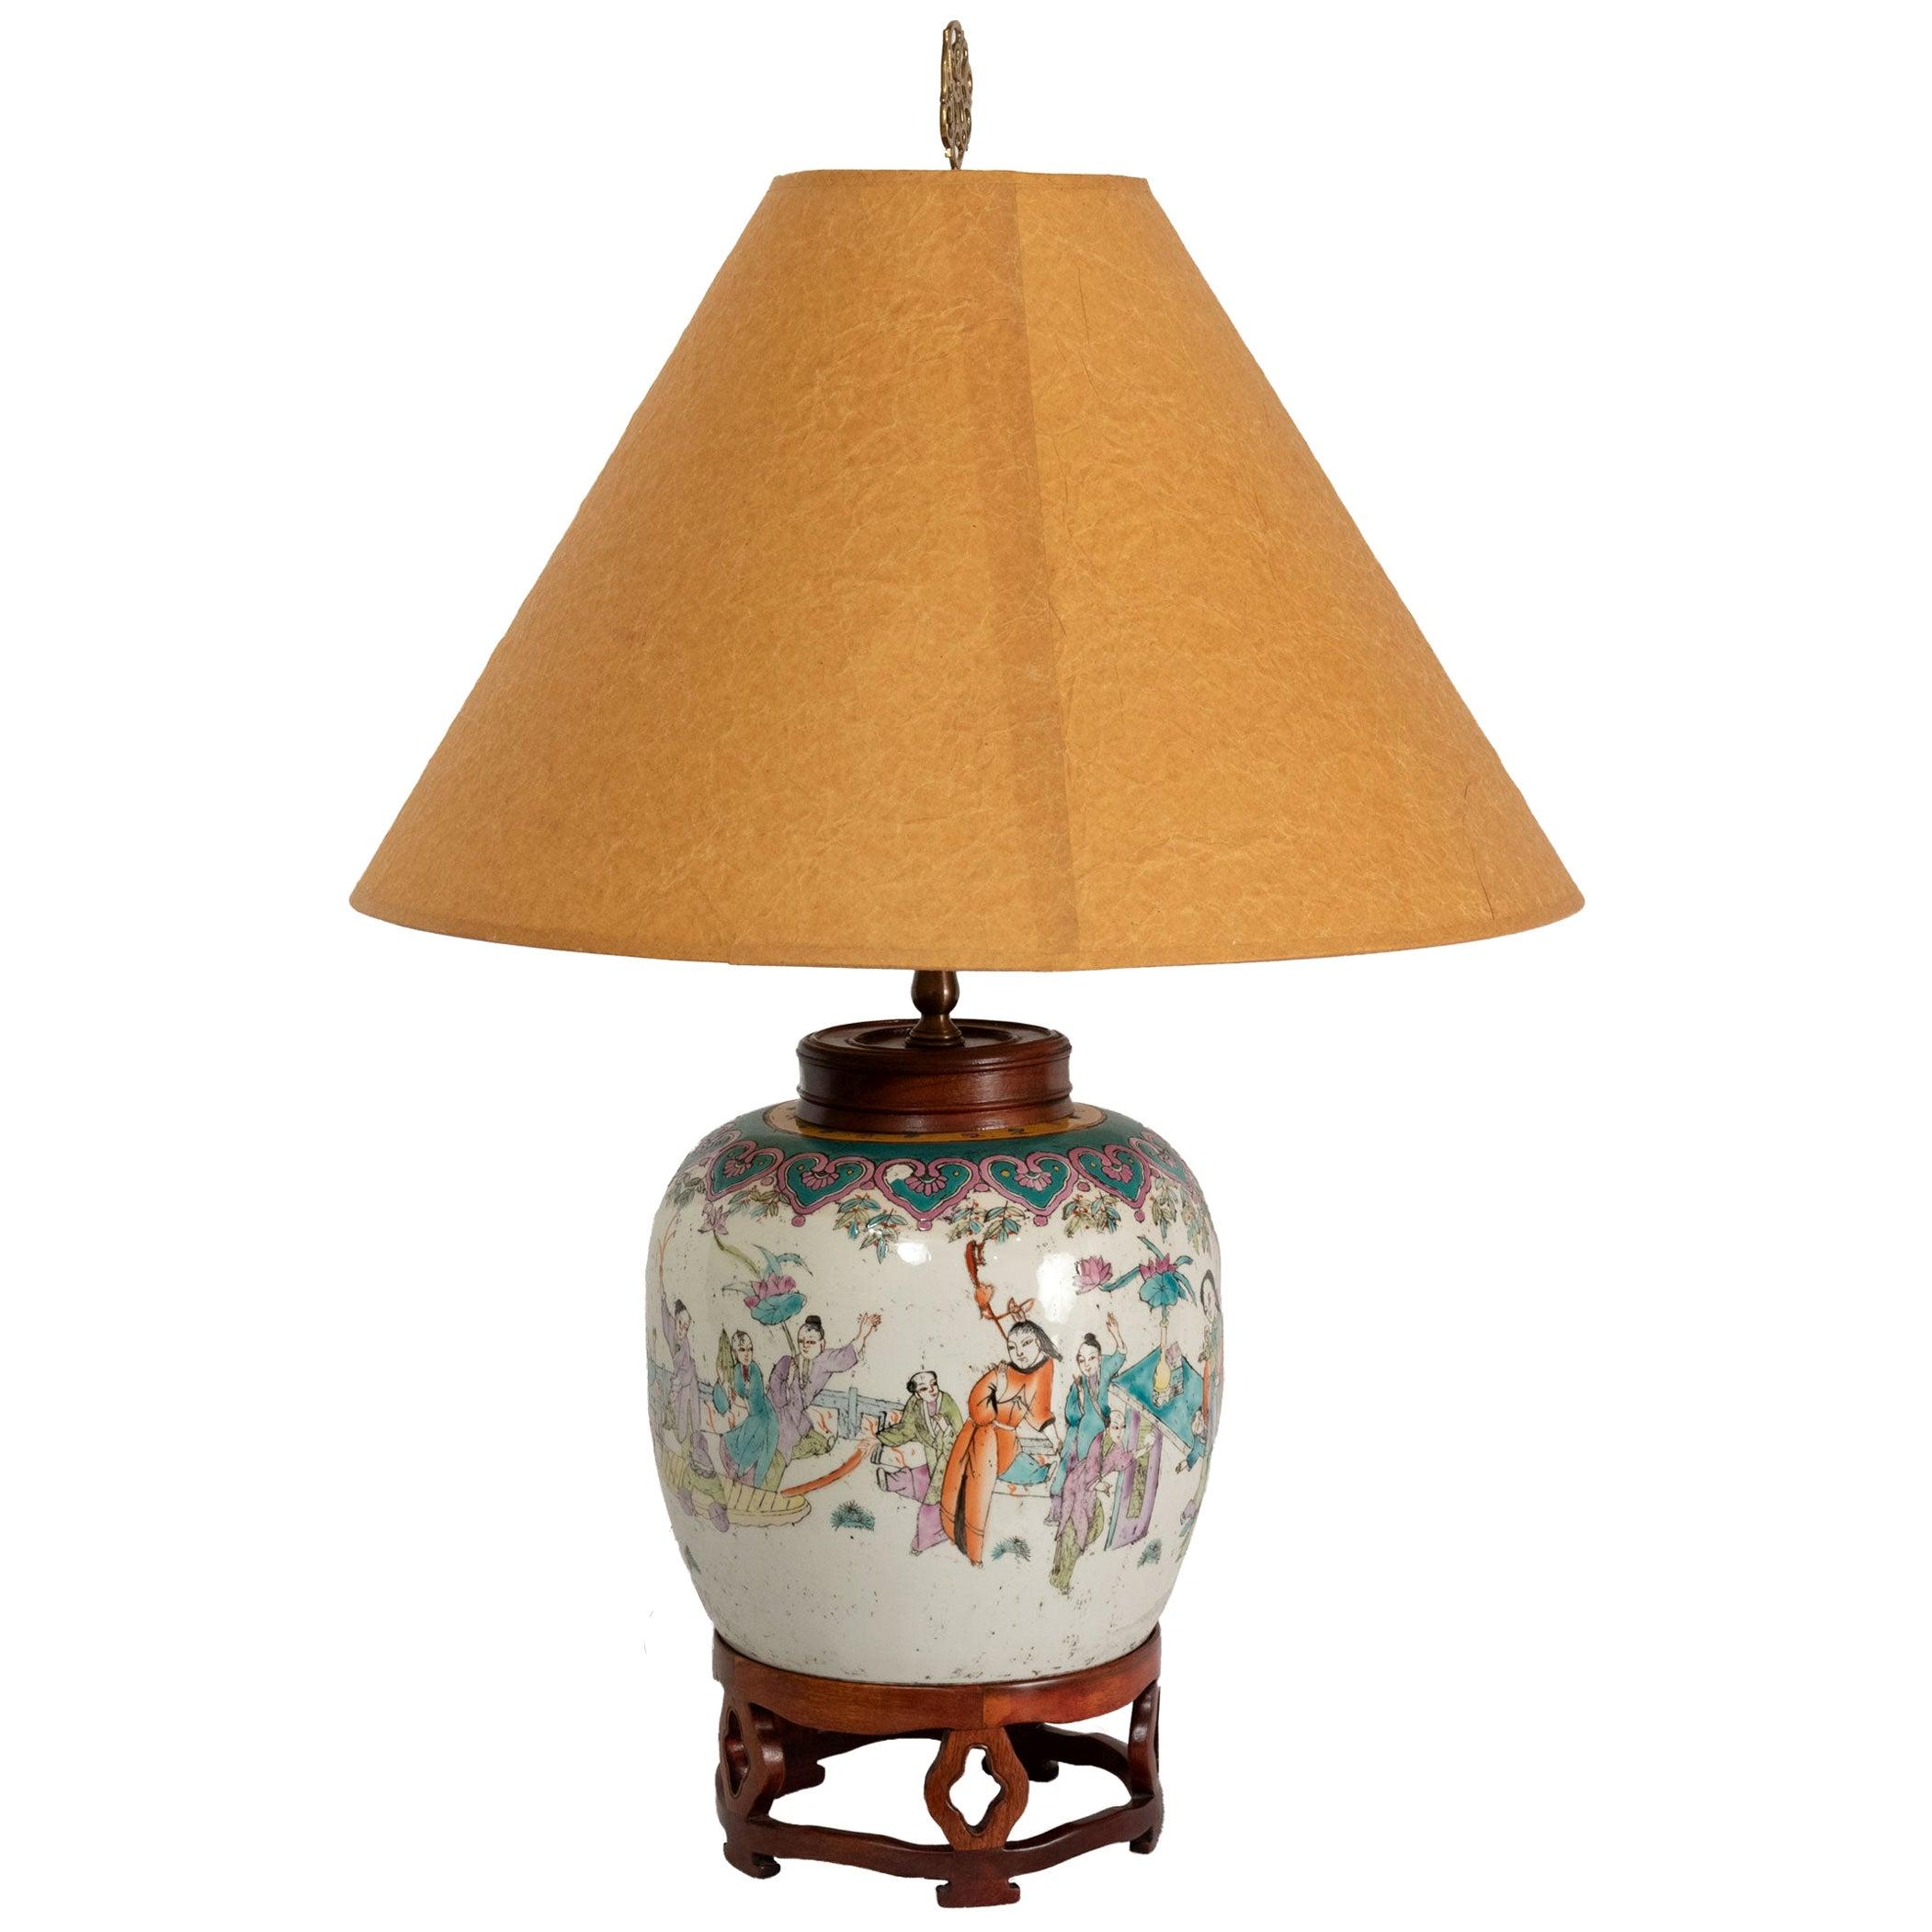 Lamped 19th Century Qing Vase